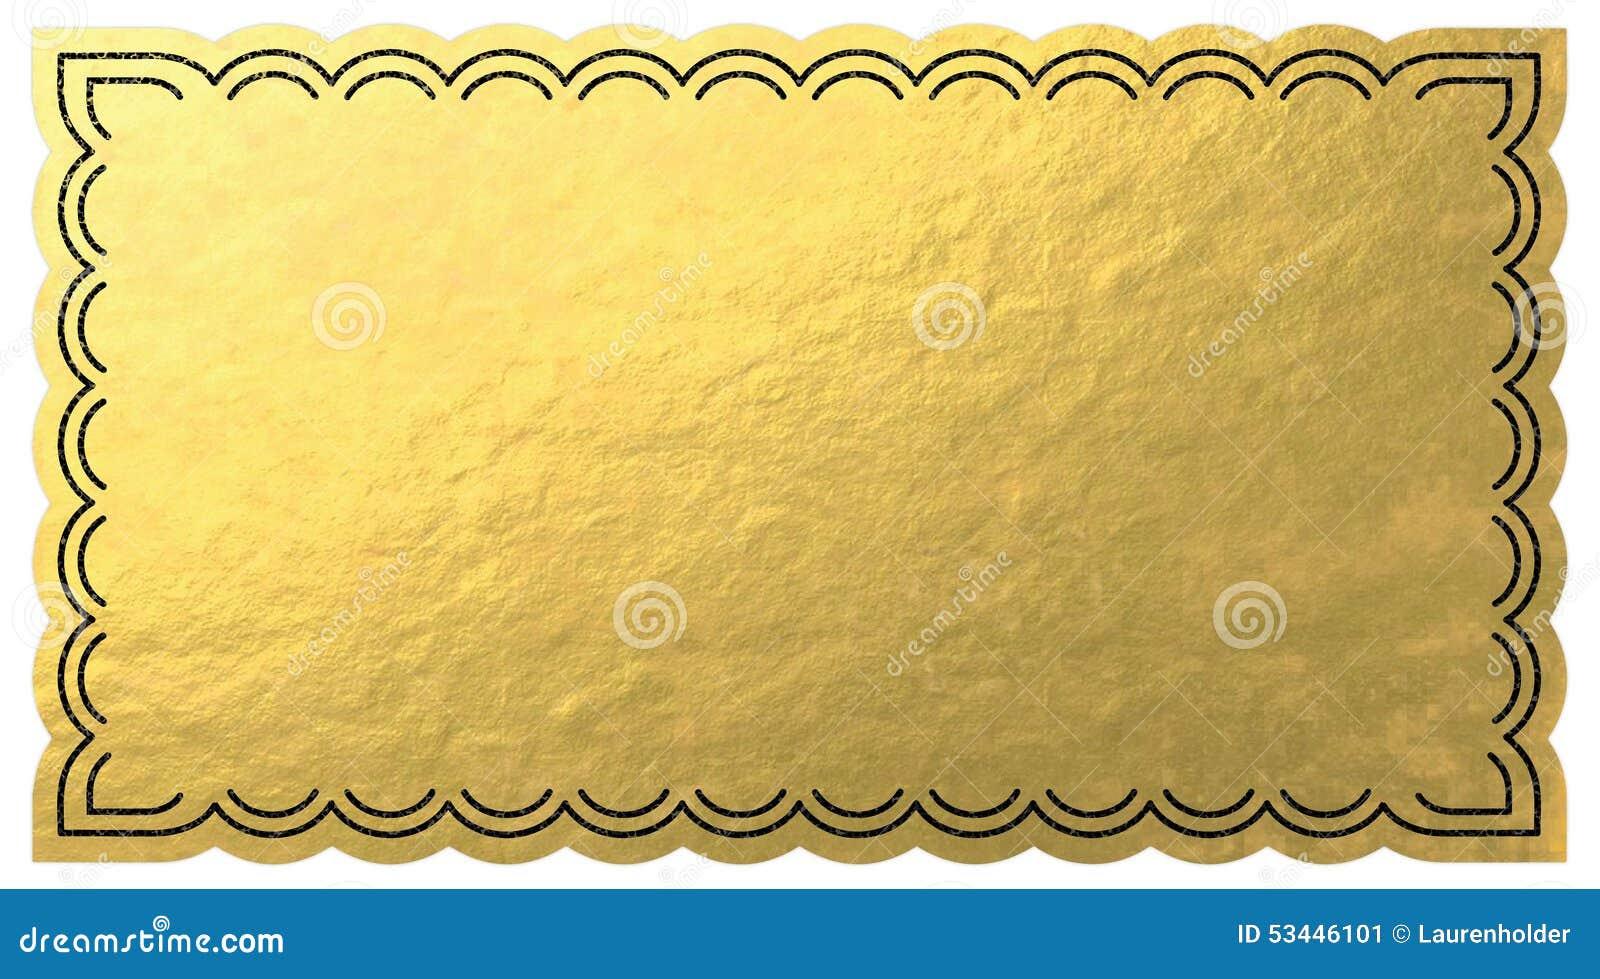 Golden Ticket Printable Template. Golden Ticket On Pinterest. 46 ...